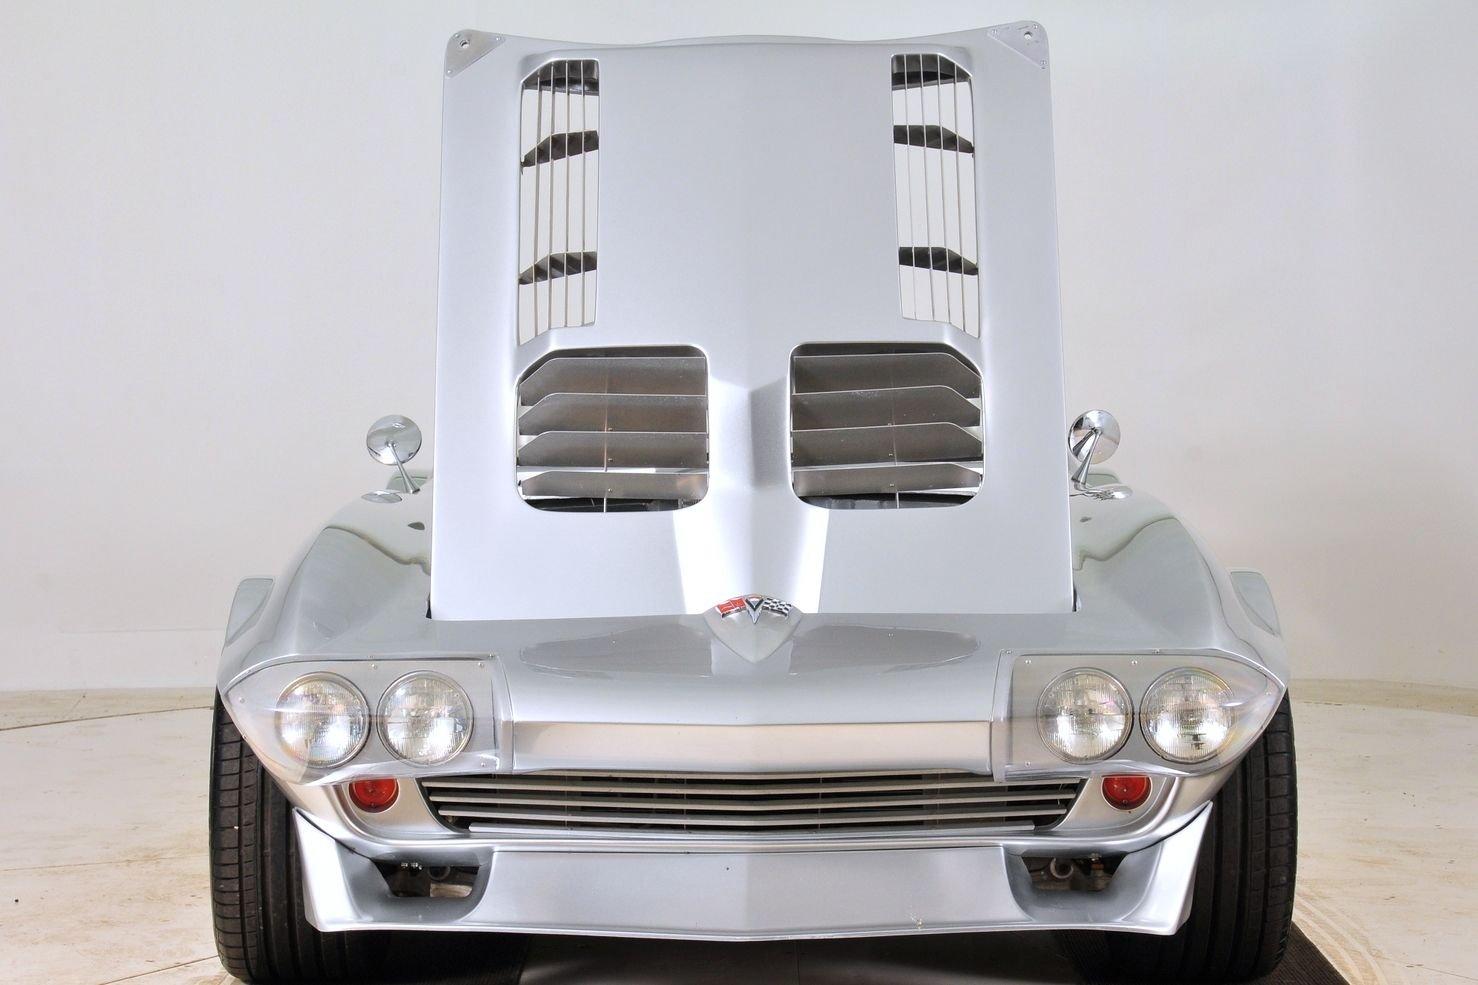 1963 Chevrolet Corvette Mongoose Motorsports Grand Sport Fast Five hood up